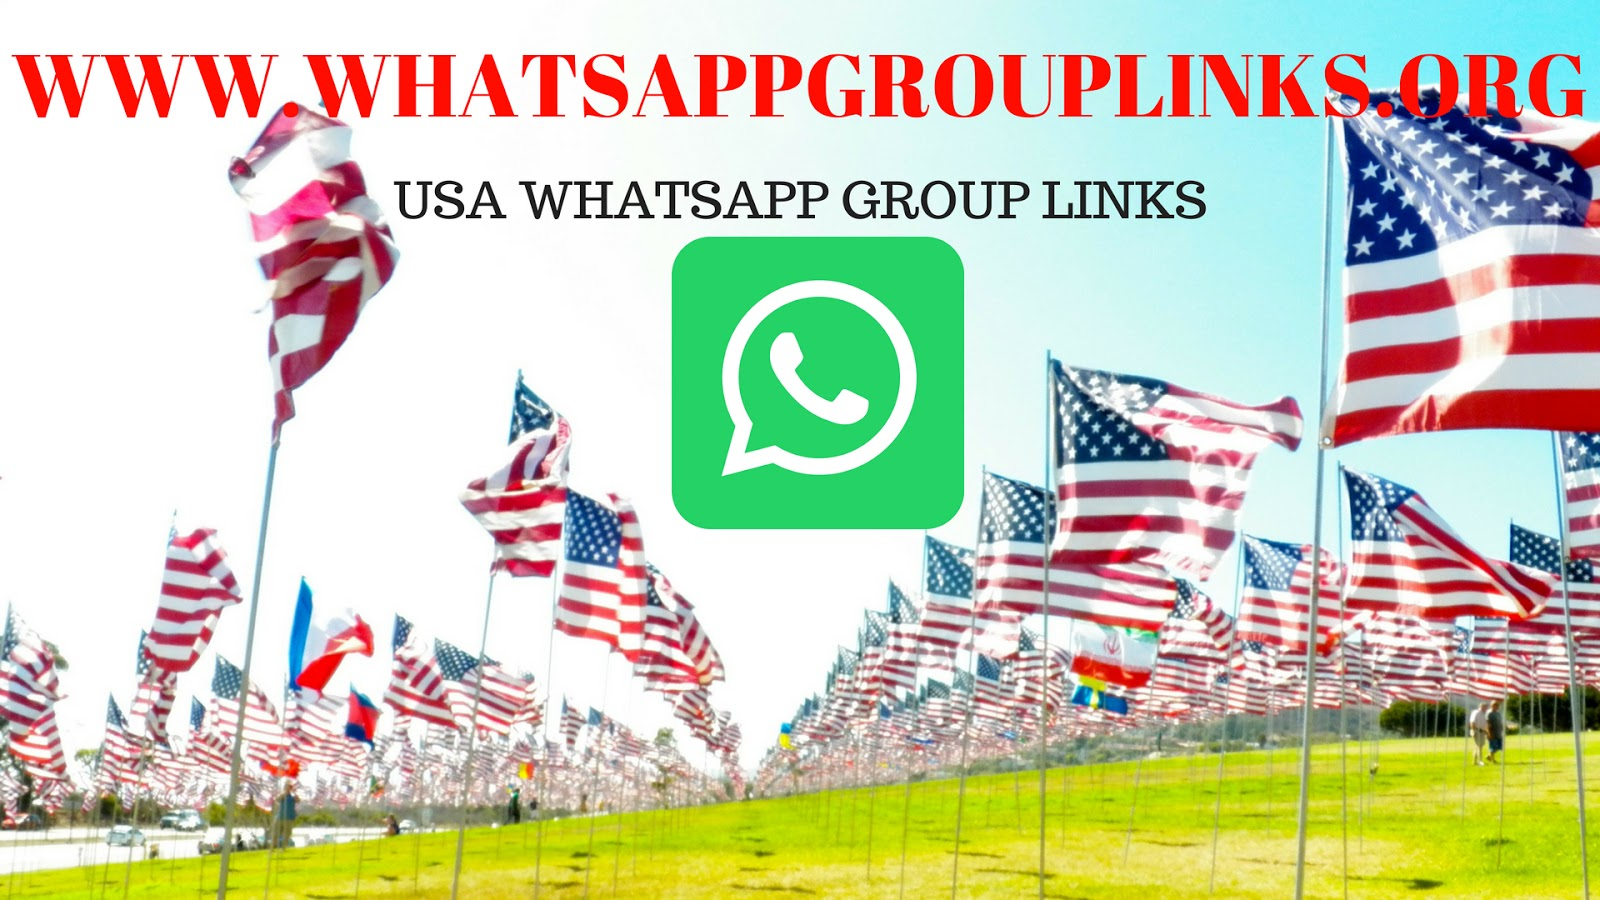 join latest USA WhatsApp group links 2018 - Whatsapp Group Links